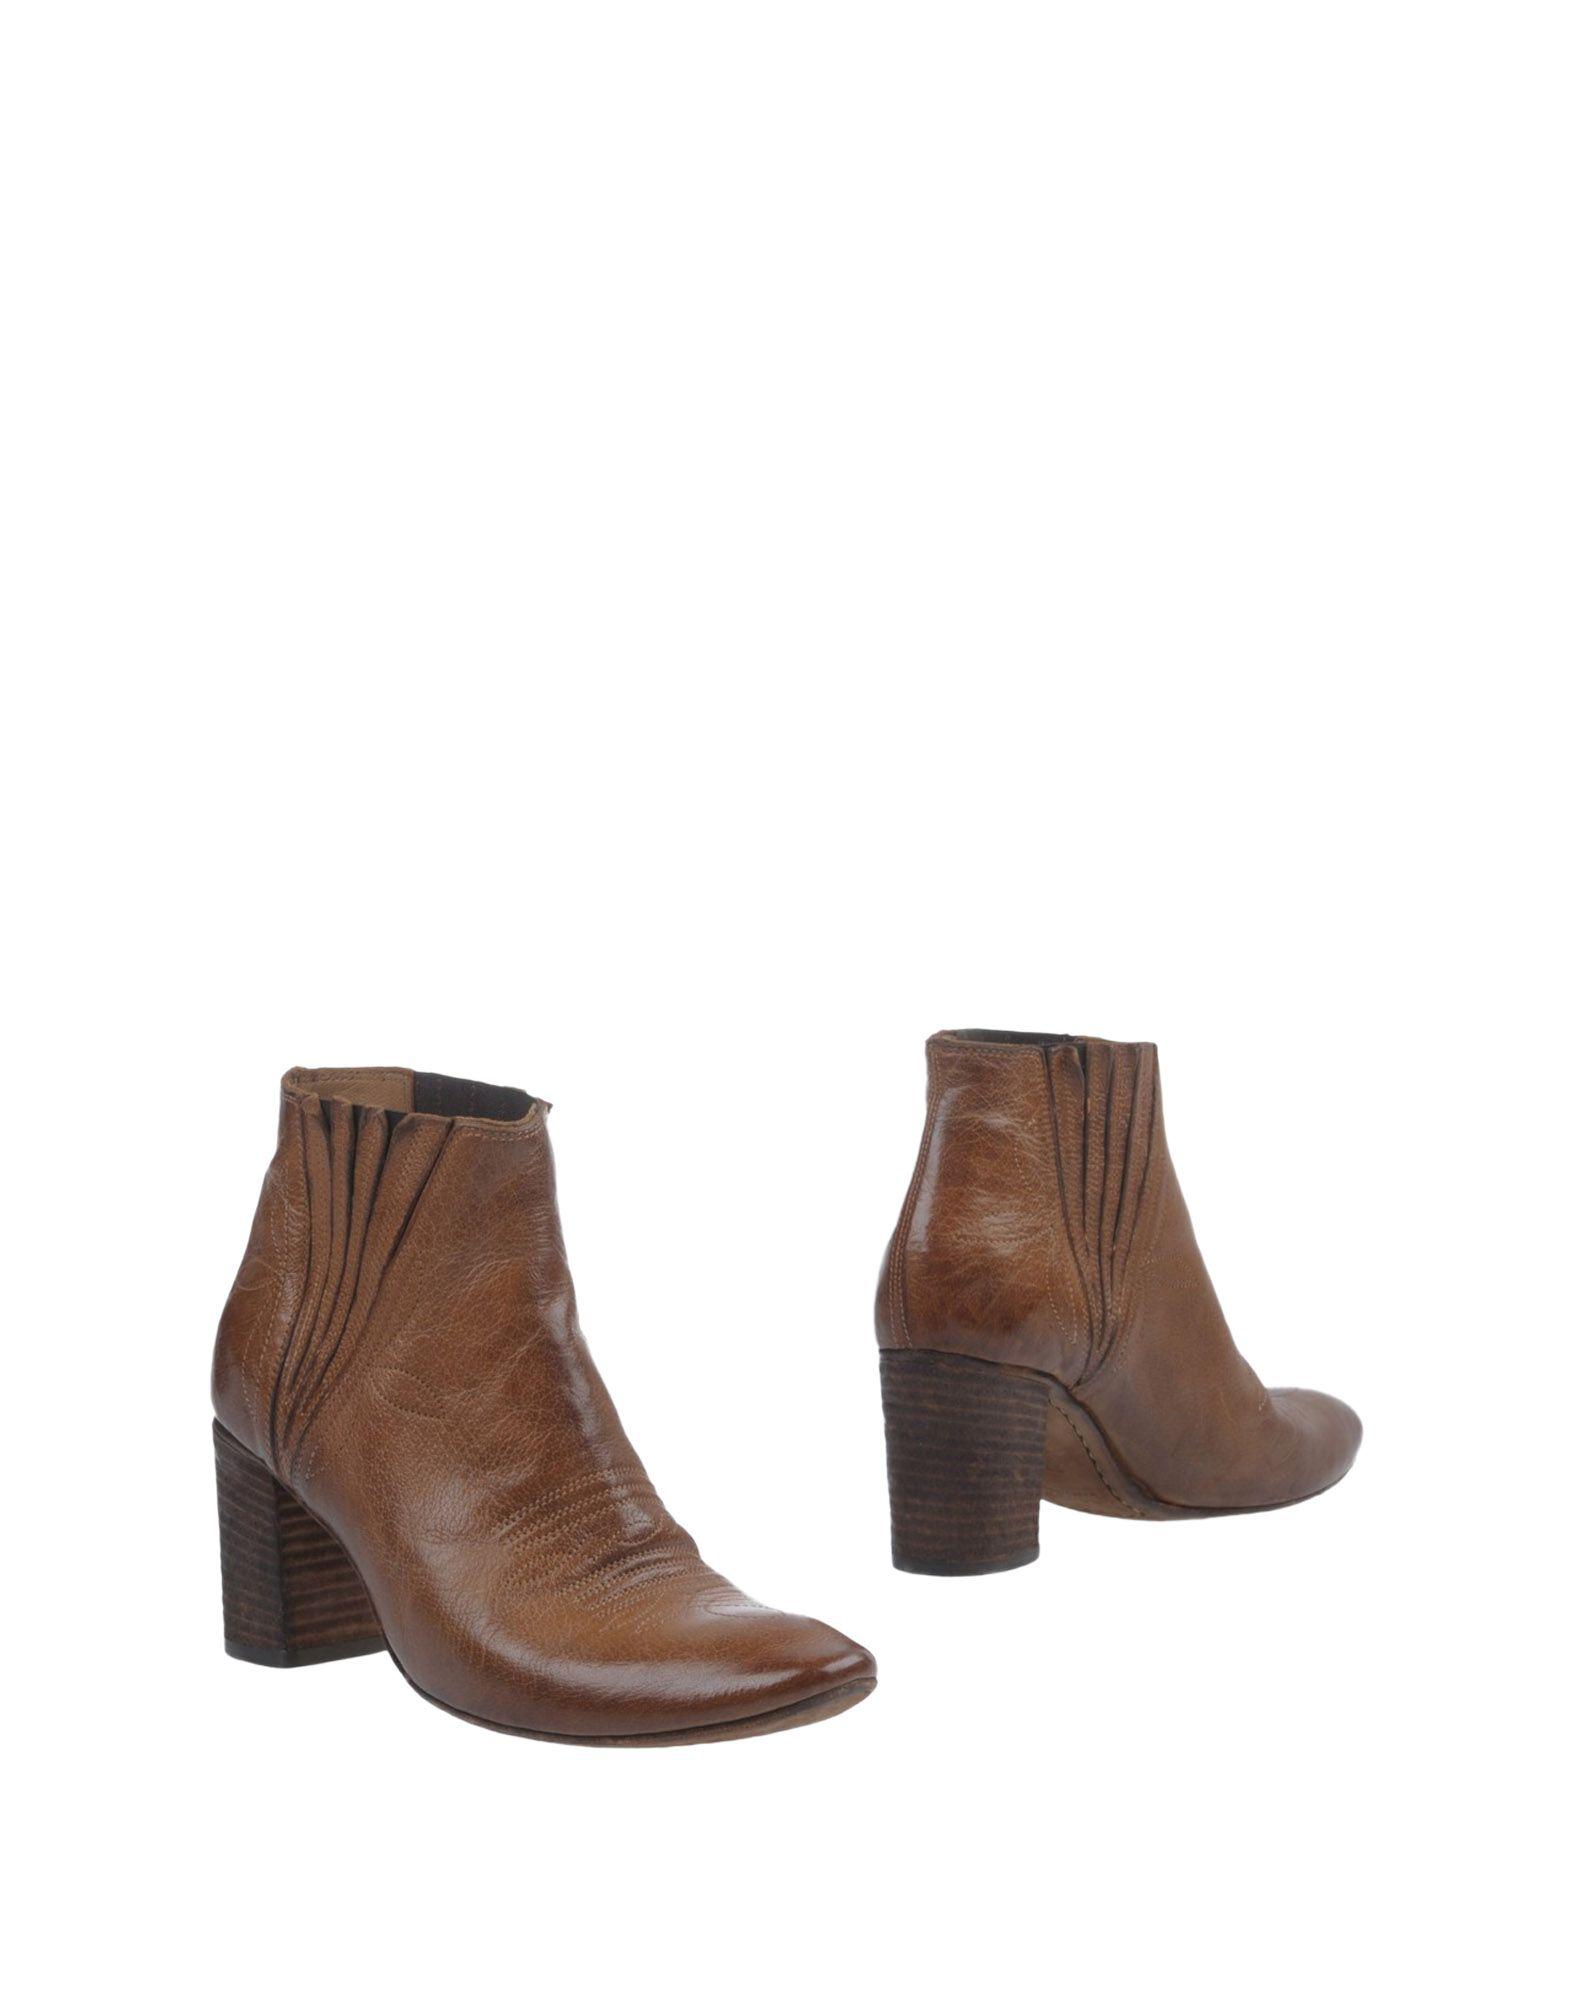 Fauzian Jeunesse Stiefelette Damen Schuhe  11385027ARGut aussehende strapazierfähige Schuhe Damen 9b54a5